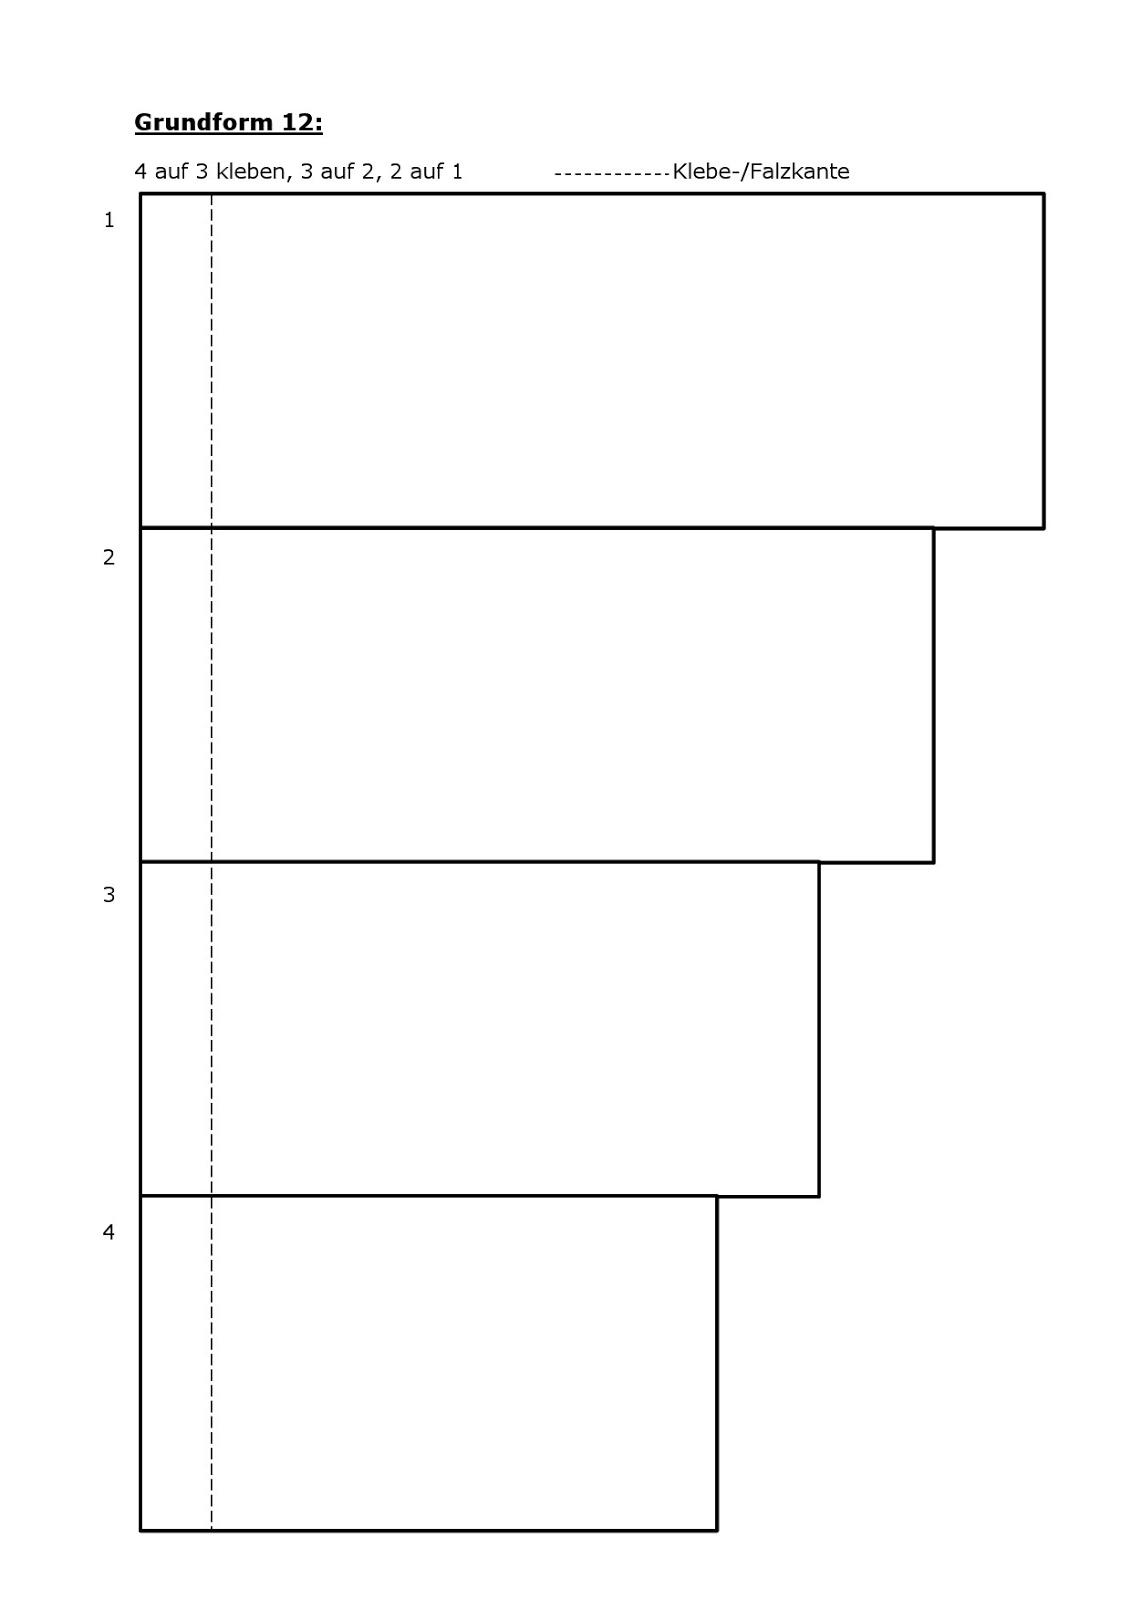 lapbook creativos, lapbook ideas, lapbook printable, lap books, lapbook plantillas, lapbook templates, lapbook vorlagen, lapbook free, lapbook vorlagen blanko, lapbook pdf,